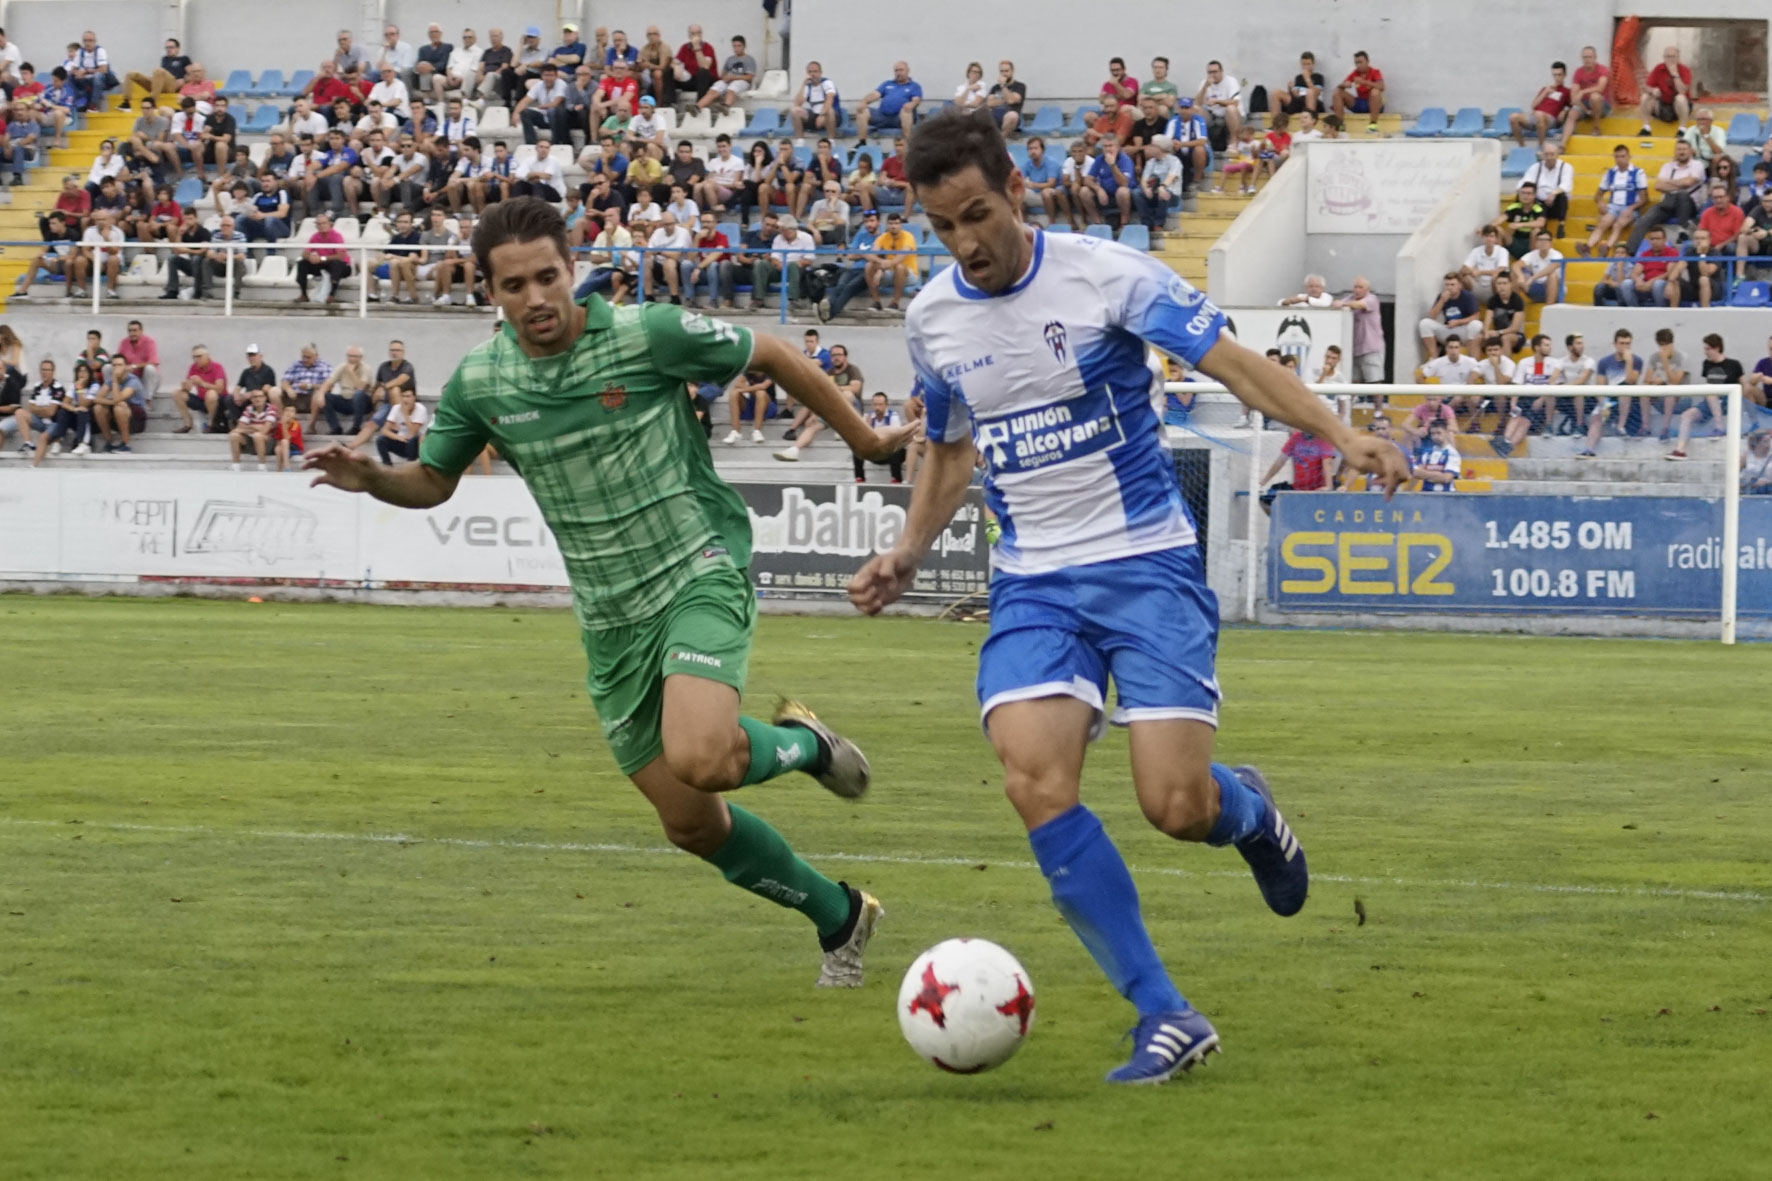 Murcia-Olot-pronostico-copa-rey